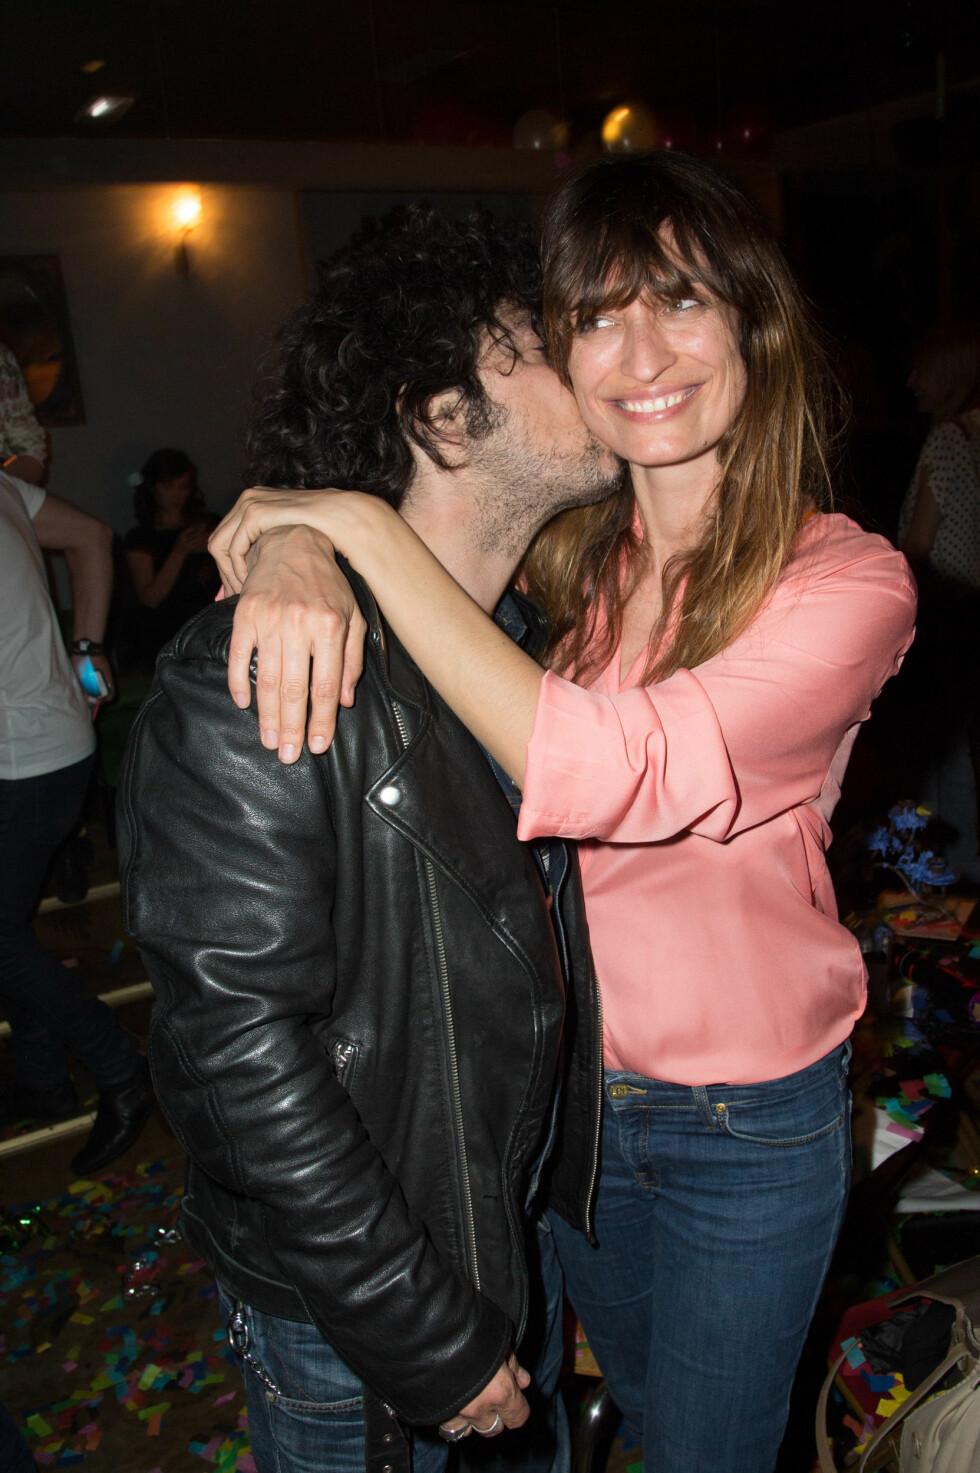 Caroline de Maigret og kjæresten Yarol Poupaud driver plateselskapet Bonus Track Records sammen.  Foto: (c) Stephane Cardinale/People Avenue/Corbis/All Over Press